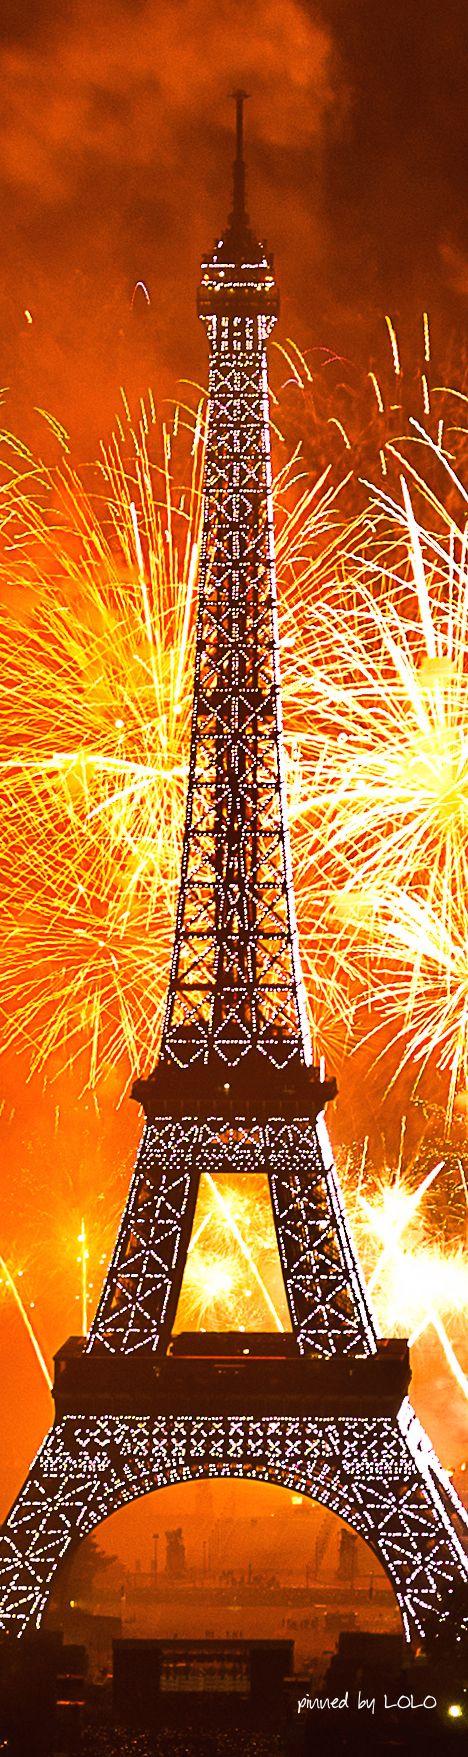 Eiffel Tower...Paris   LOLO❤︎  (image by Yann Caradec via Flickr)